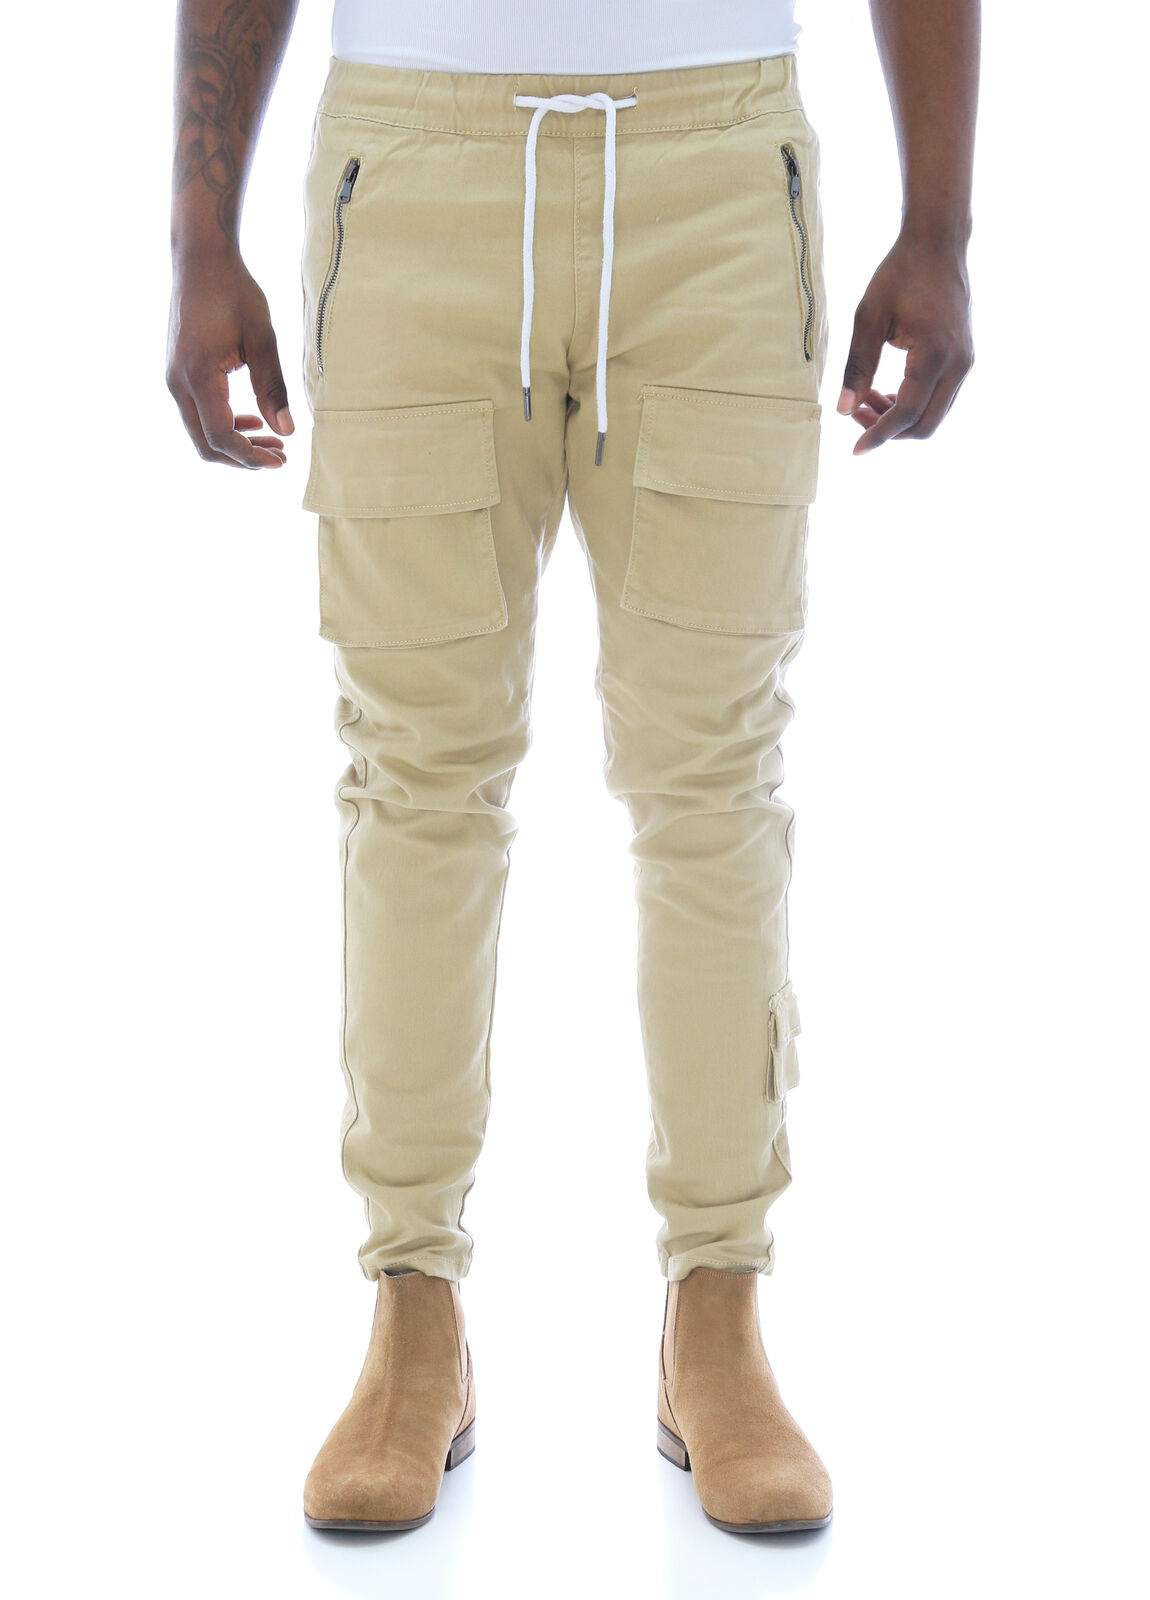 Kayden K Men's Slim Tapered Twill Cargo Jogger Pants With Zipper